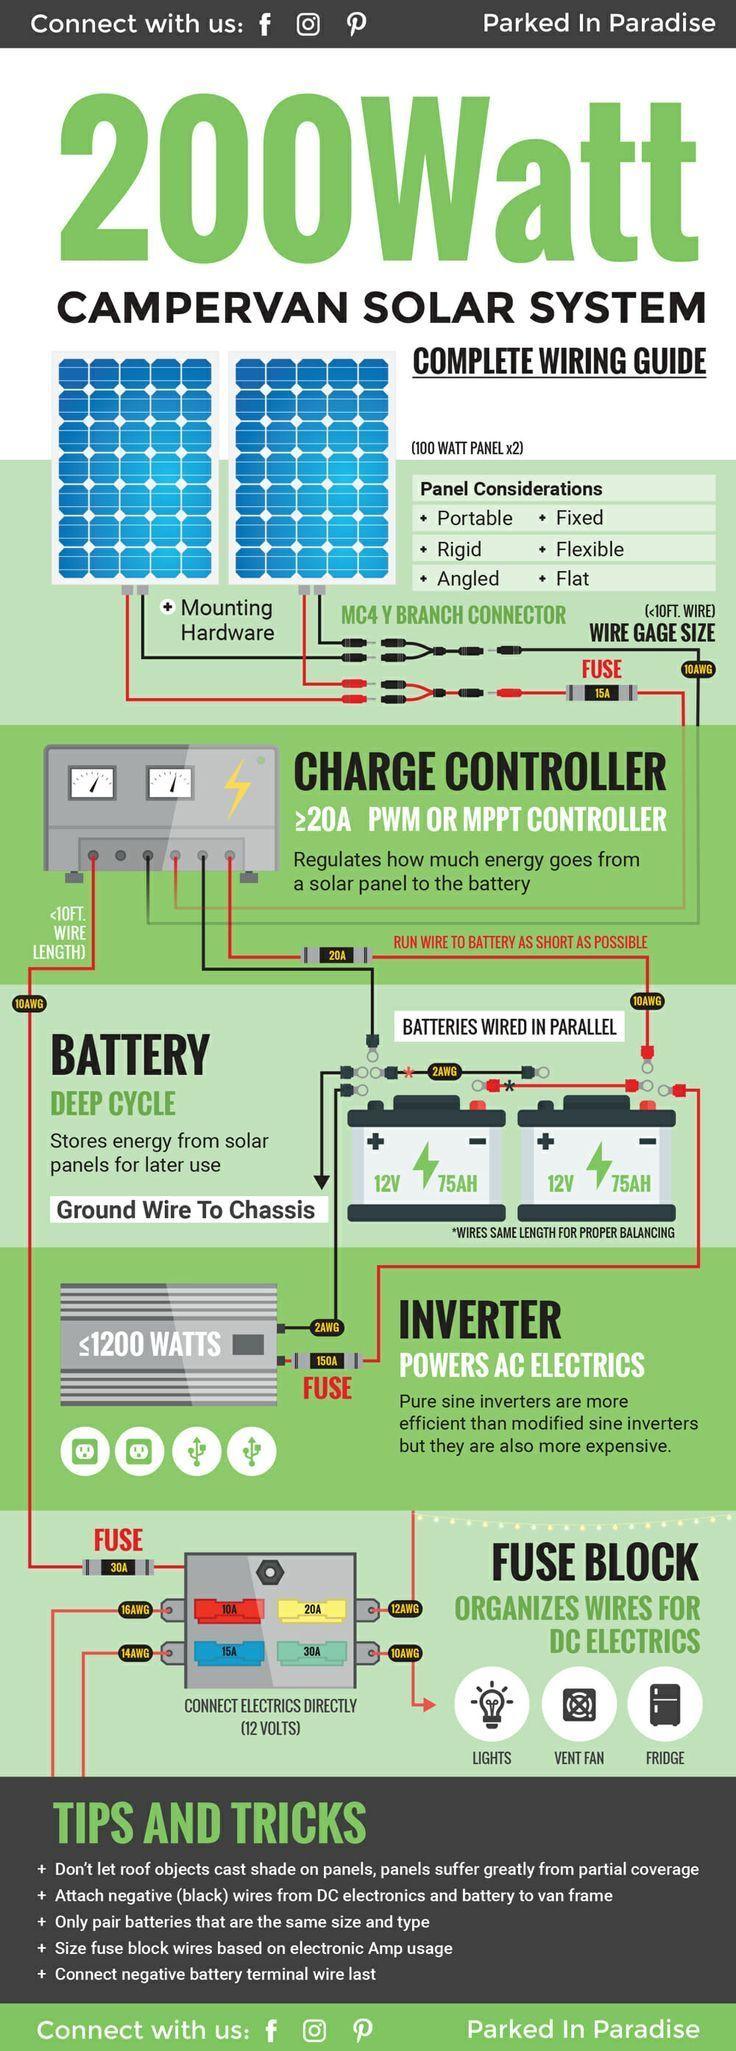 solar panel calculator diy wiring diagrams calculator. Black Bedroom Furniture Sets. Home Design Ideas